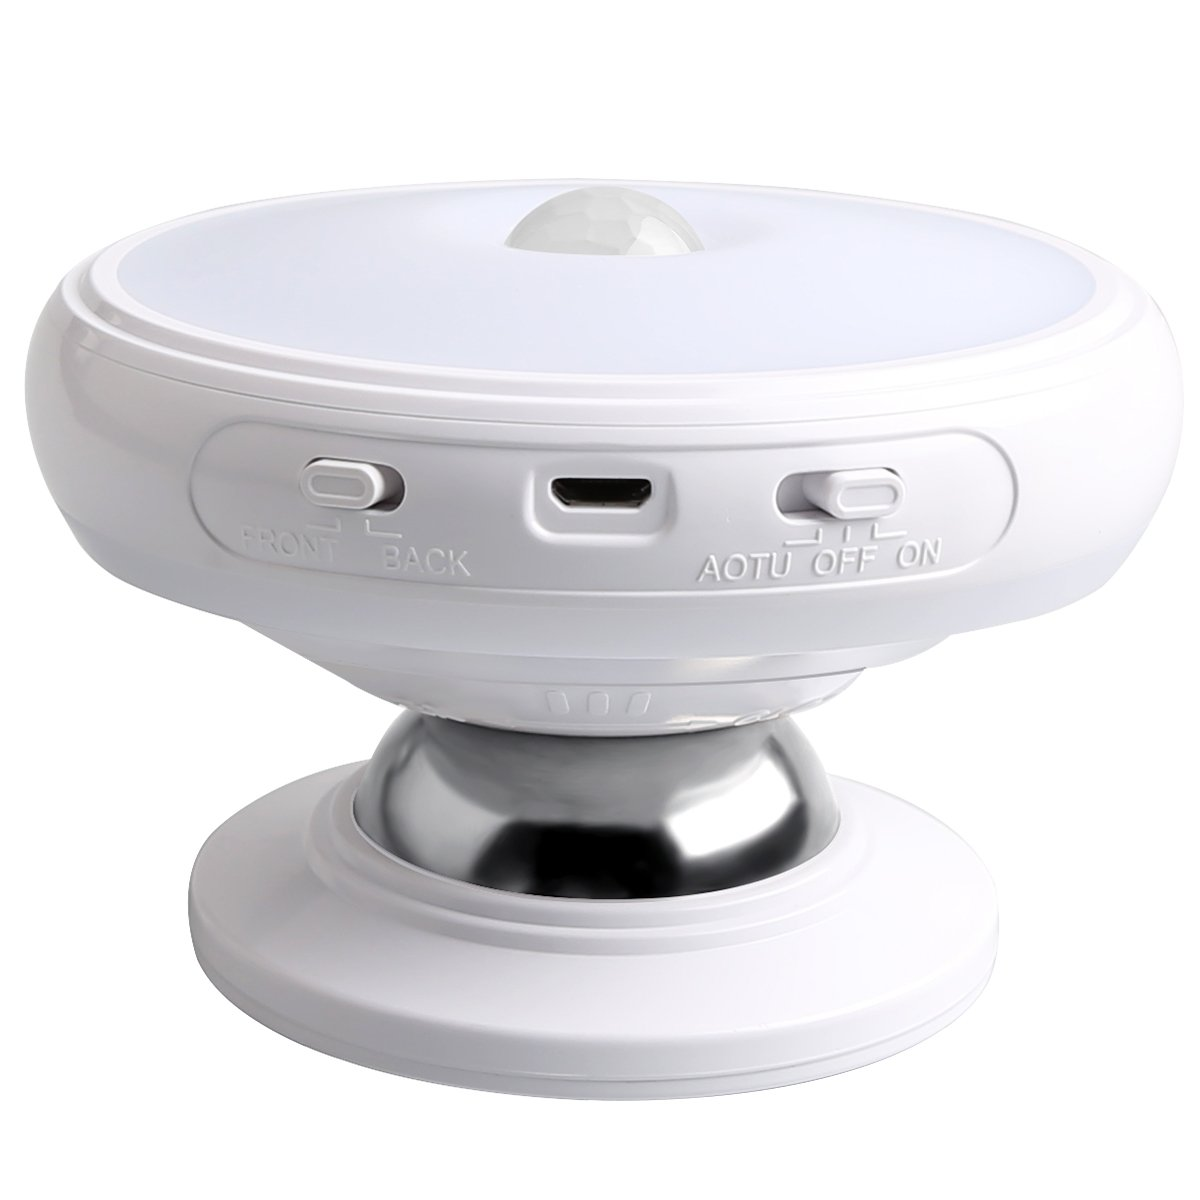 Motion Sensor Night Light, Detachable Magnet Base, USB Rechargeable LED,  Human Body Induction 360 Degree Rotation Night Light, Closet Lights Lamp,  ...